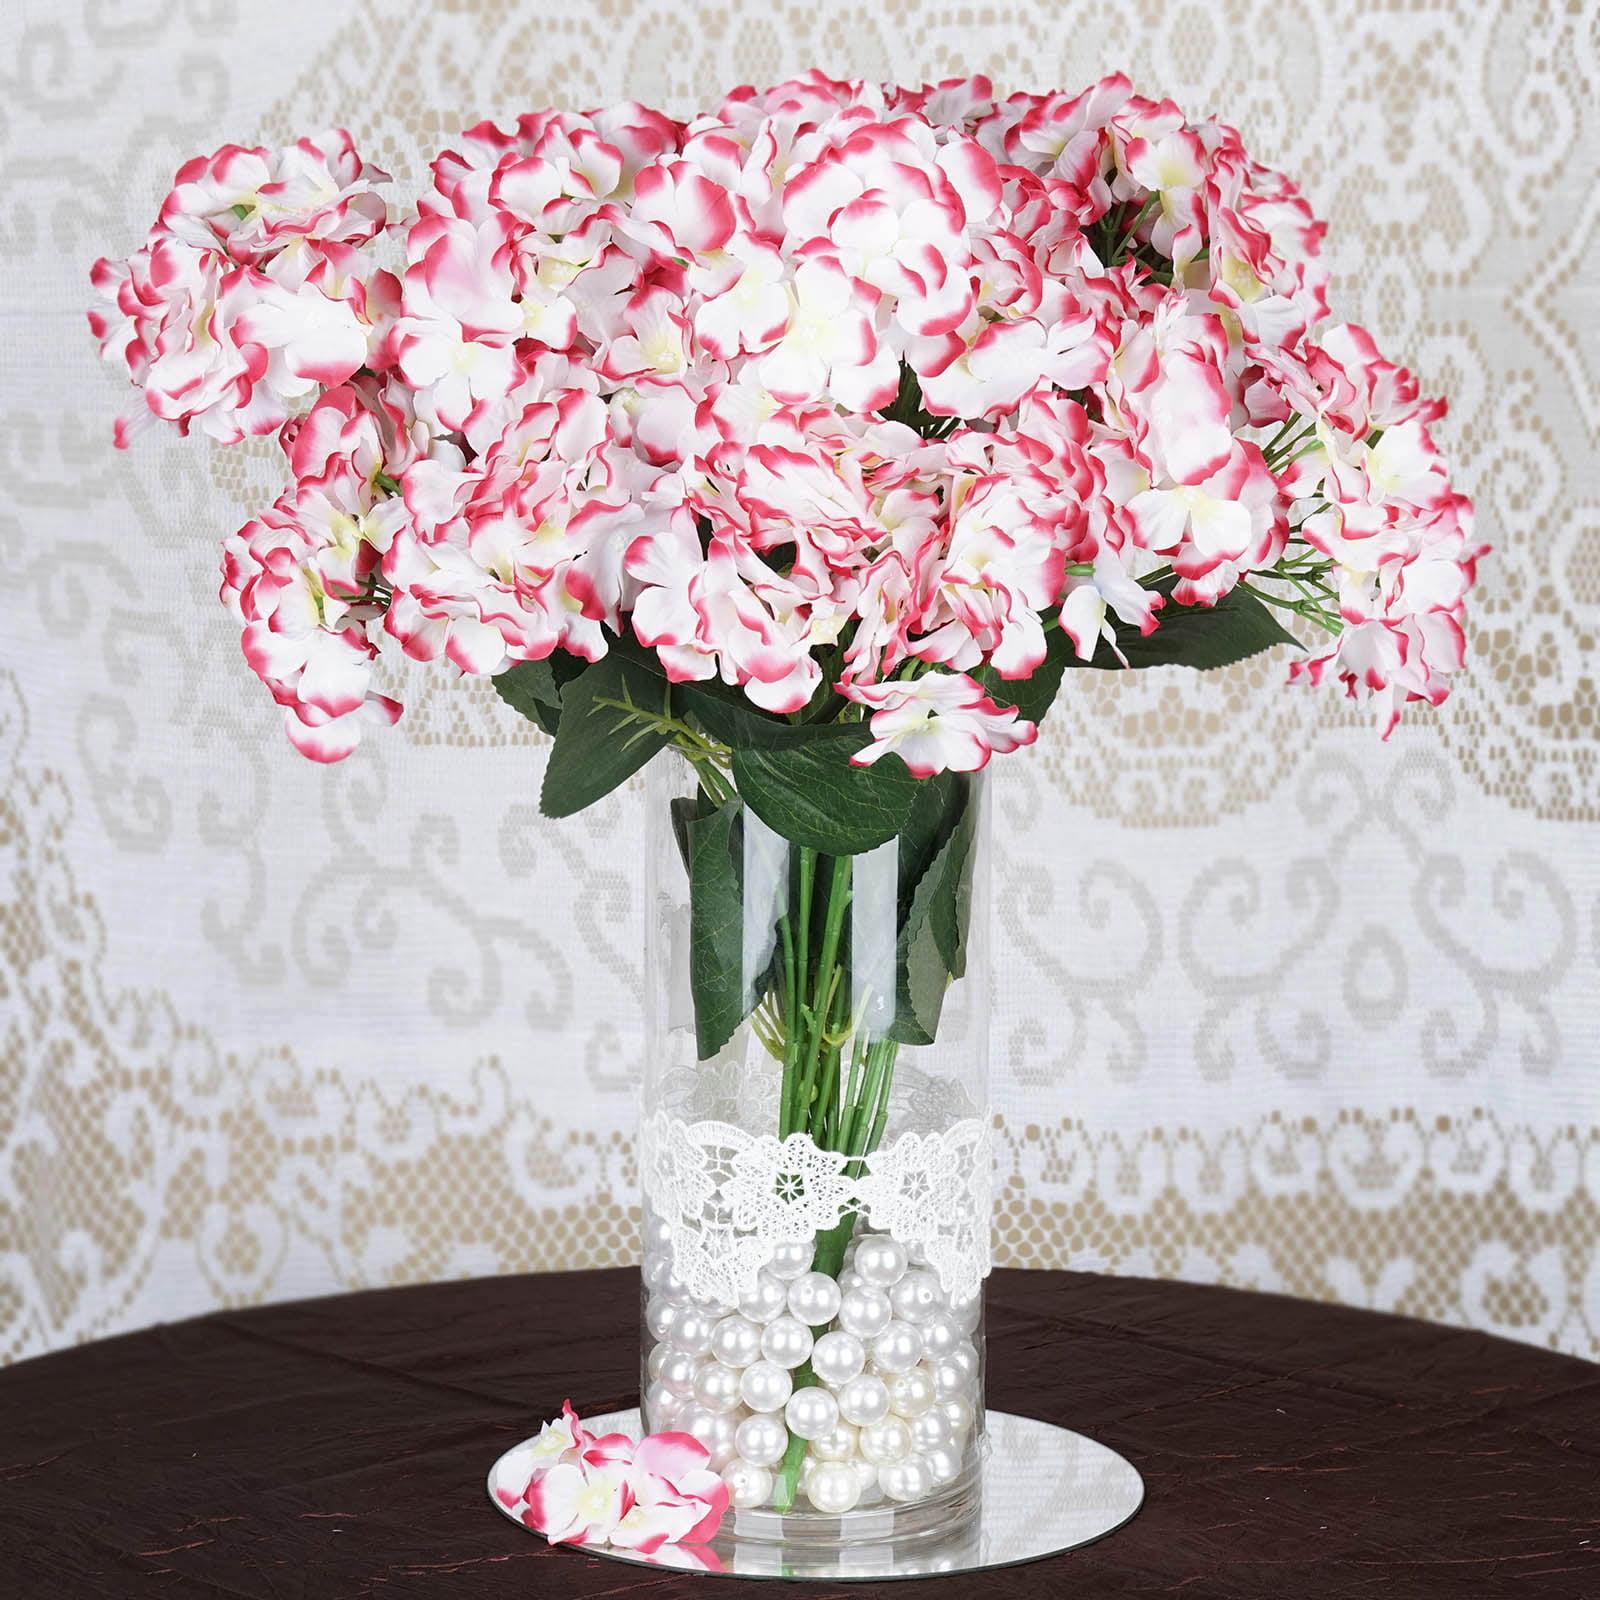 BalsaCircle 28 Silk Hydrangea Flowers - DIY Home Wedding Party Artificial Bouquets Arrangements Centerpieces